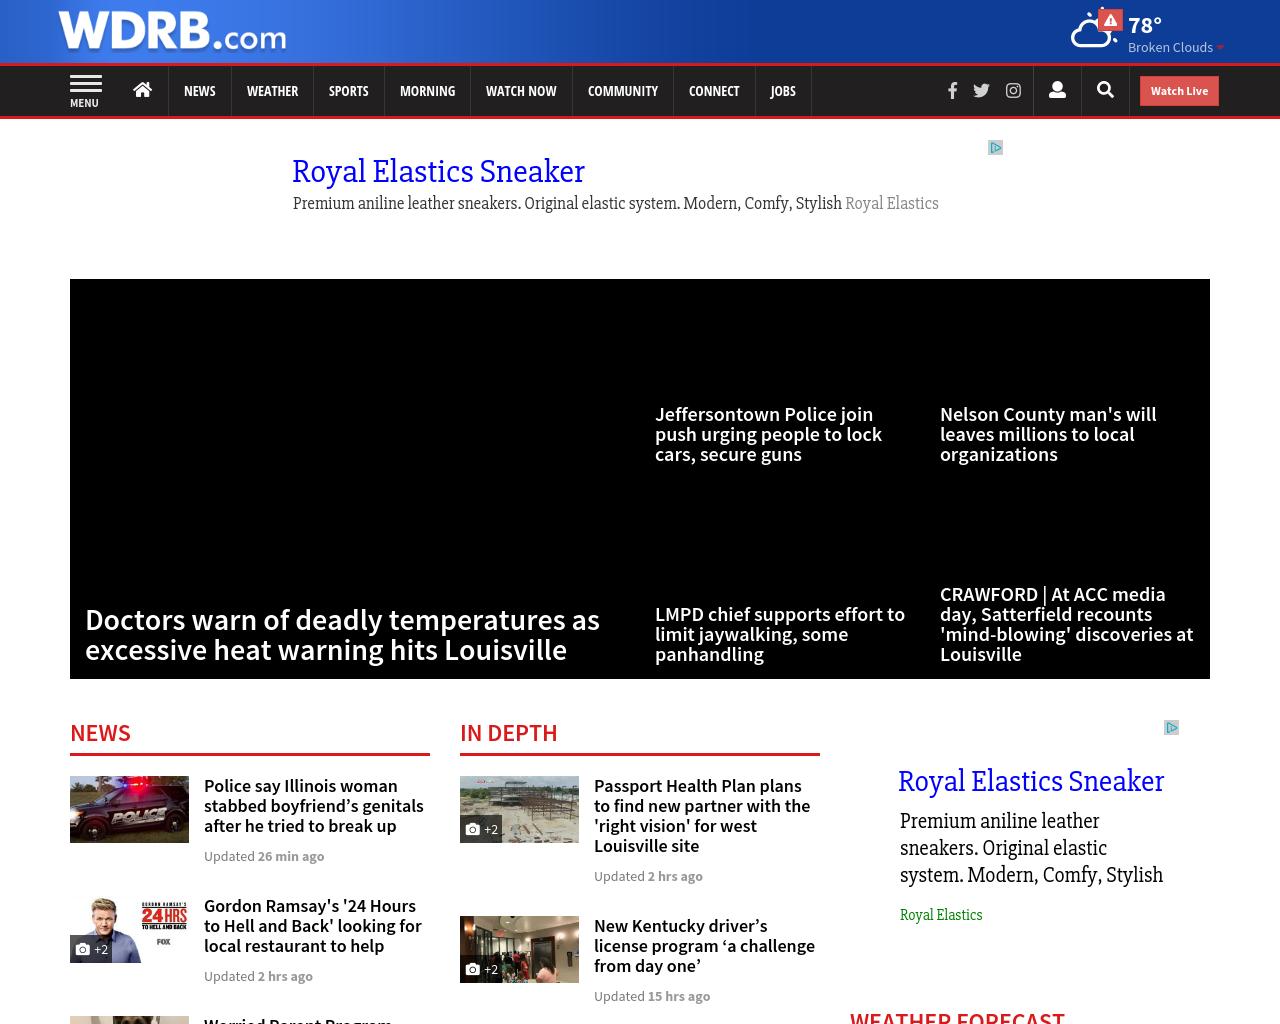 WDRB com Advertising Mediakits, Reviews, Pricing, Traffic